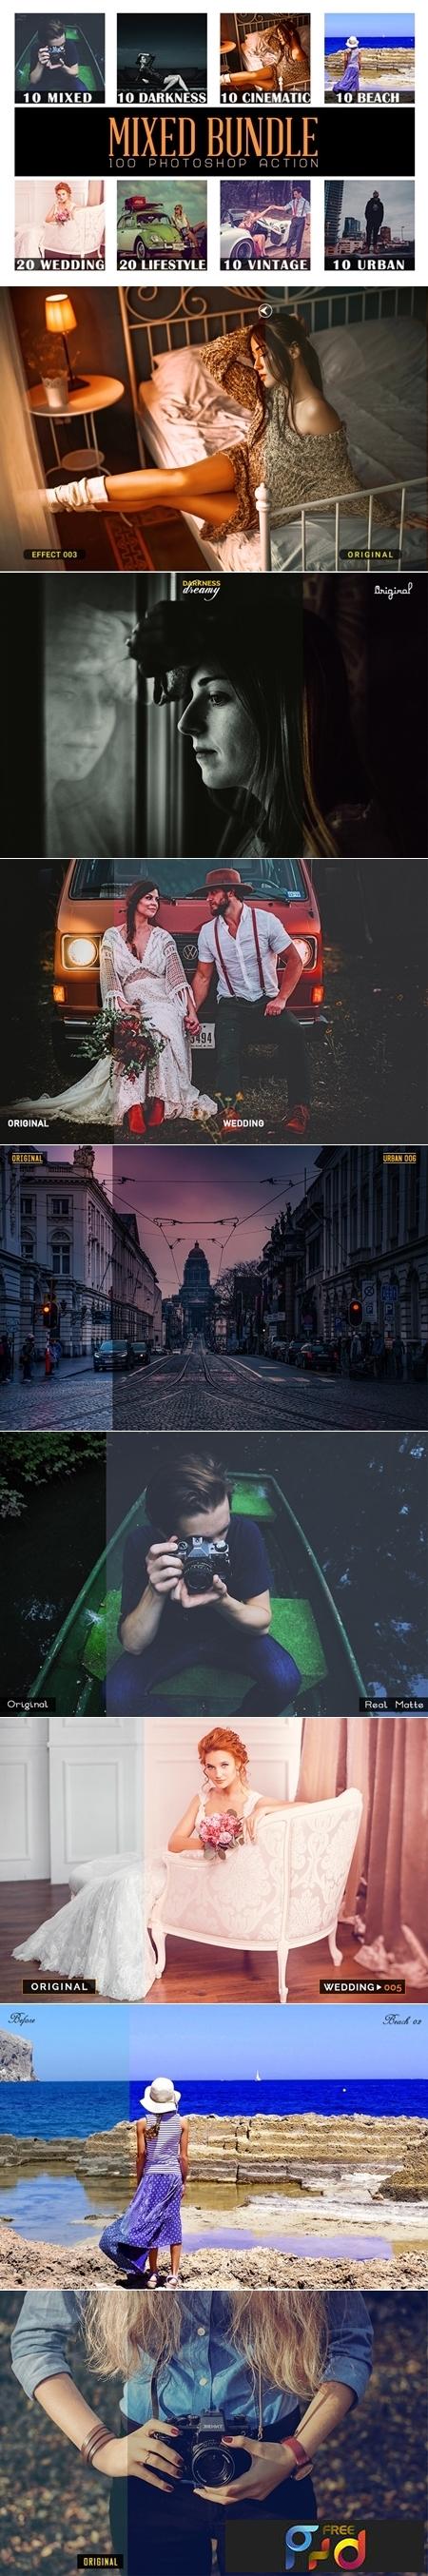 100 Mixed Bundle Photoshop Action 1